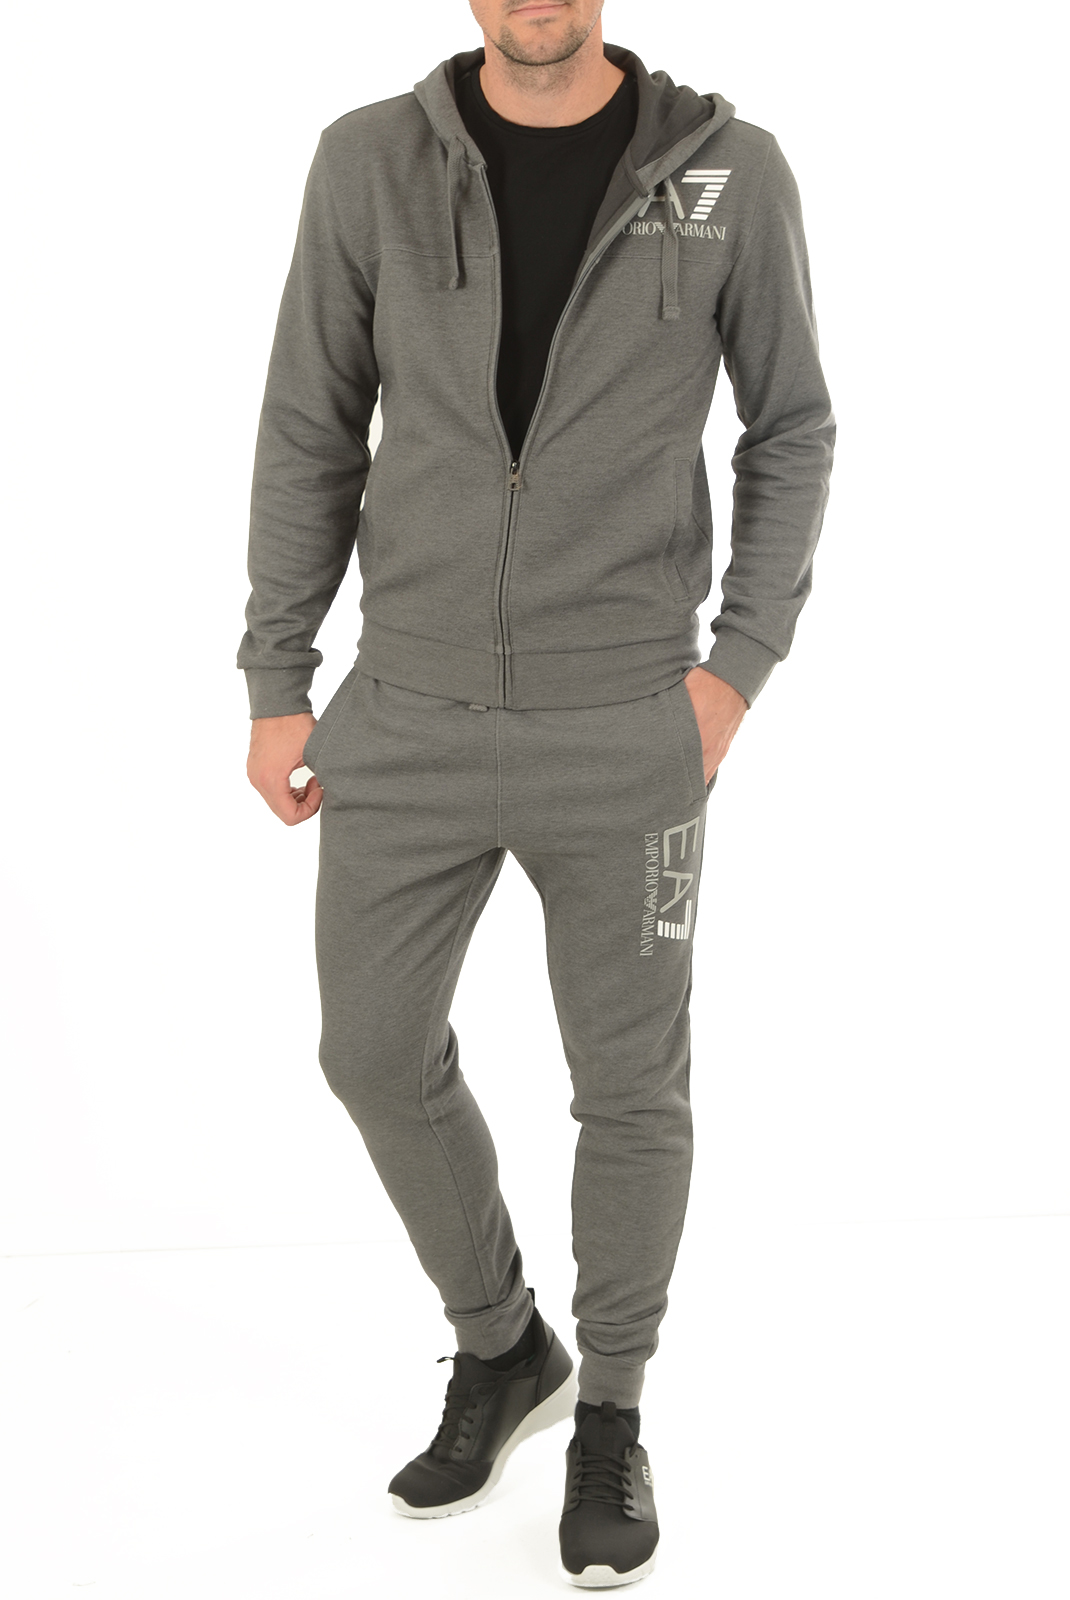 Pantalons sport/streetwear  Emporio armani 6YPP87 PJF3Z 3925 DK GREY MELANGED